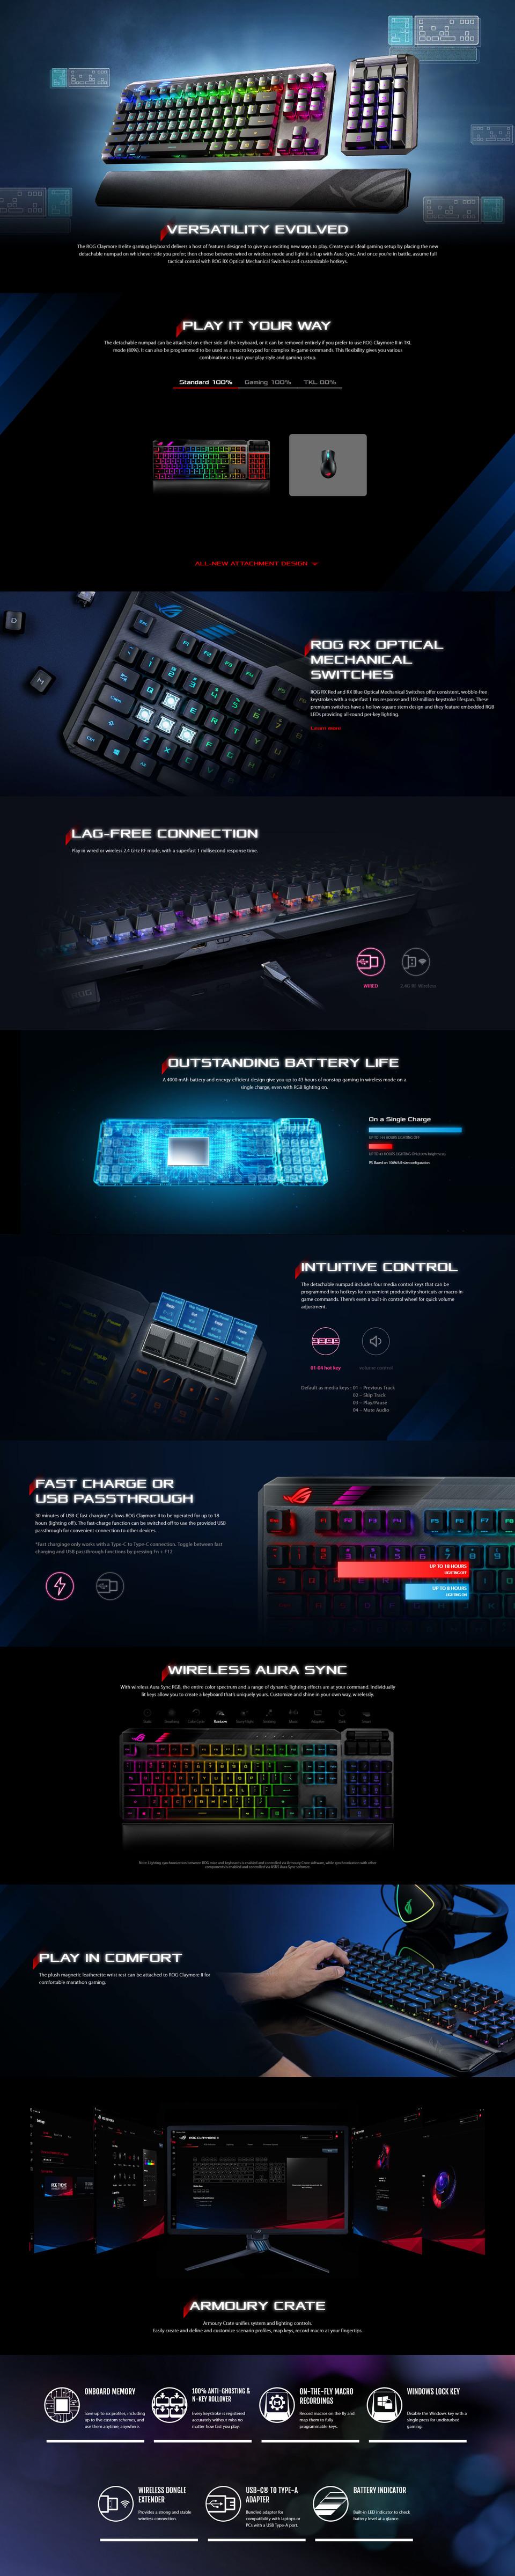 asus rog claymore ii modular wired rgb mechanical gaming keyboard